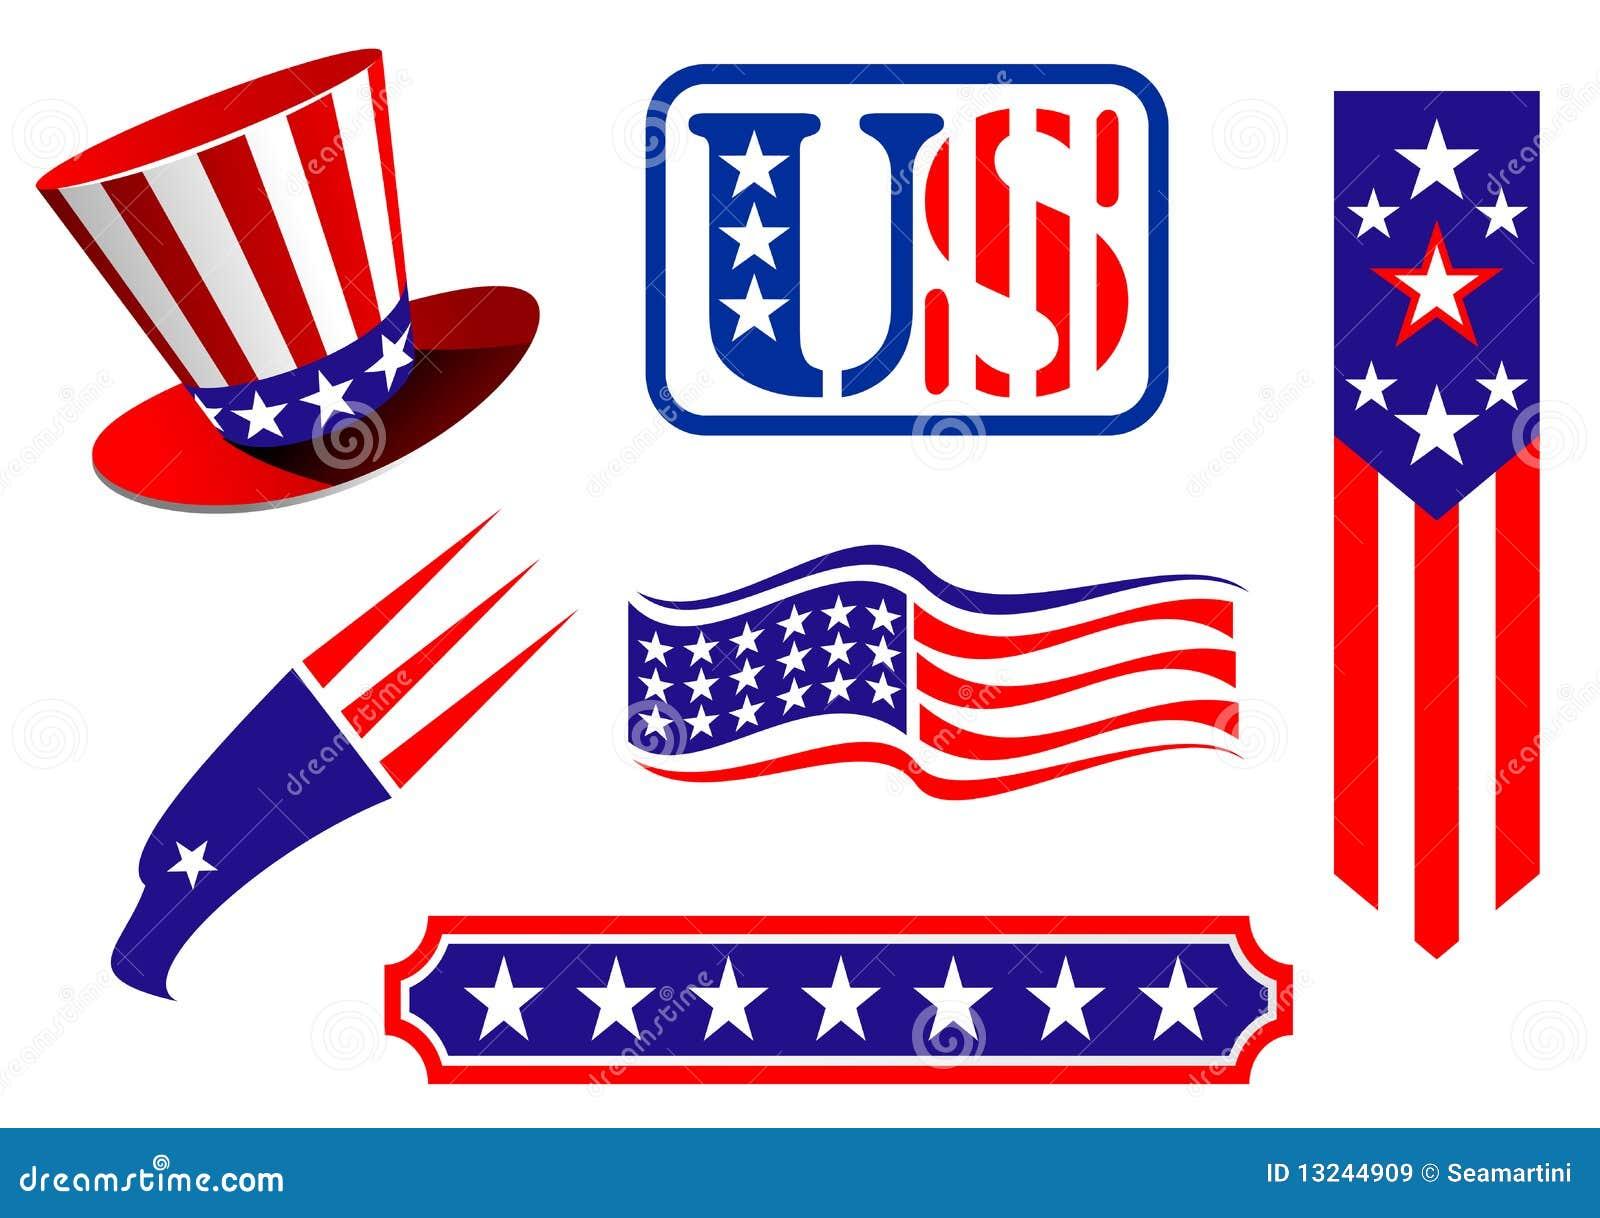 American Patriotic Symbols Stock Vector Illustration Of Design